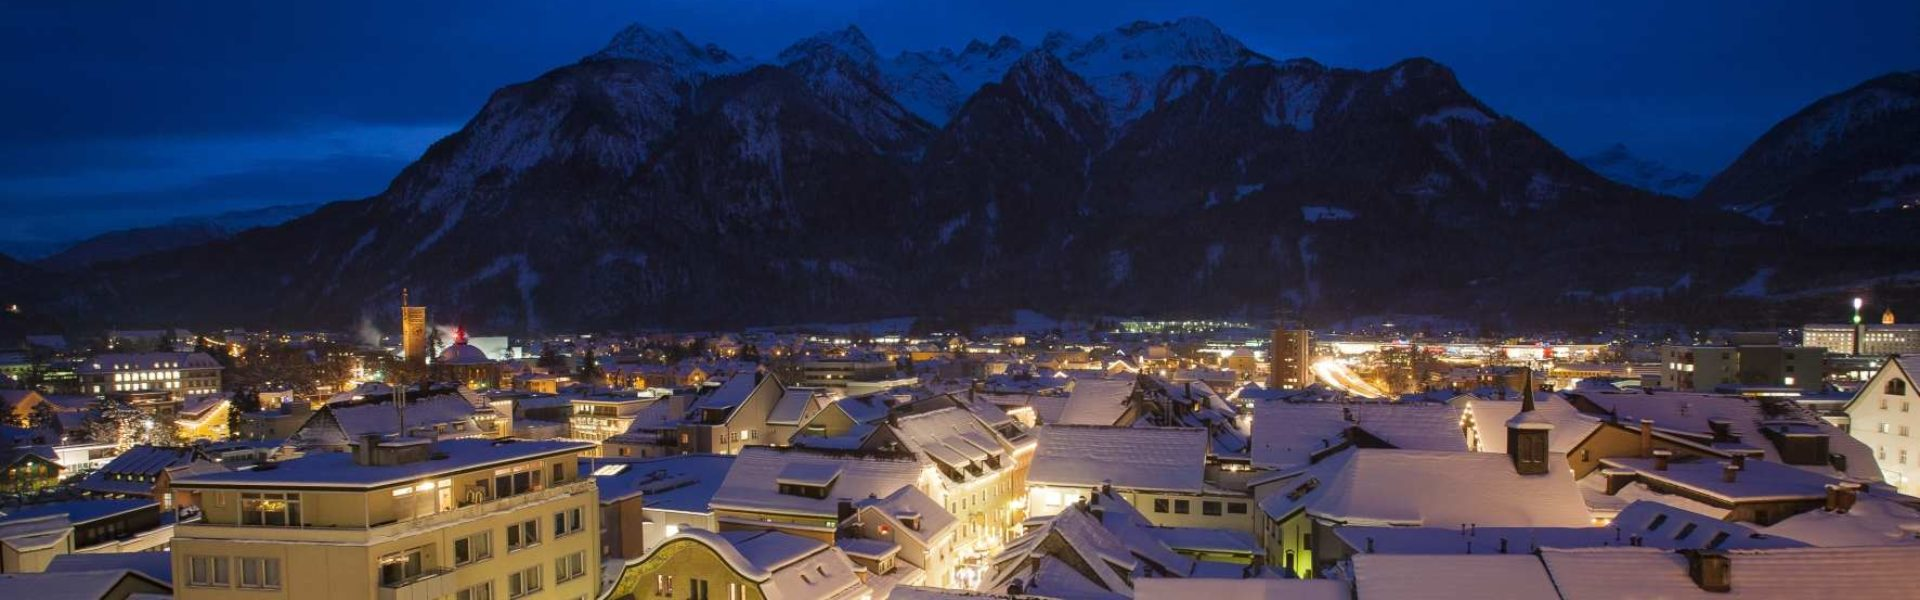 Alpenstadt Bludenz im Winter (c) Andreas Gaßner Fotografie - Bludenz Stadtmarketing GmbH